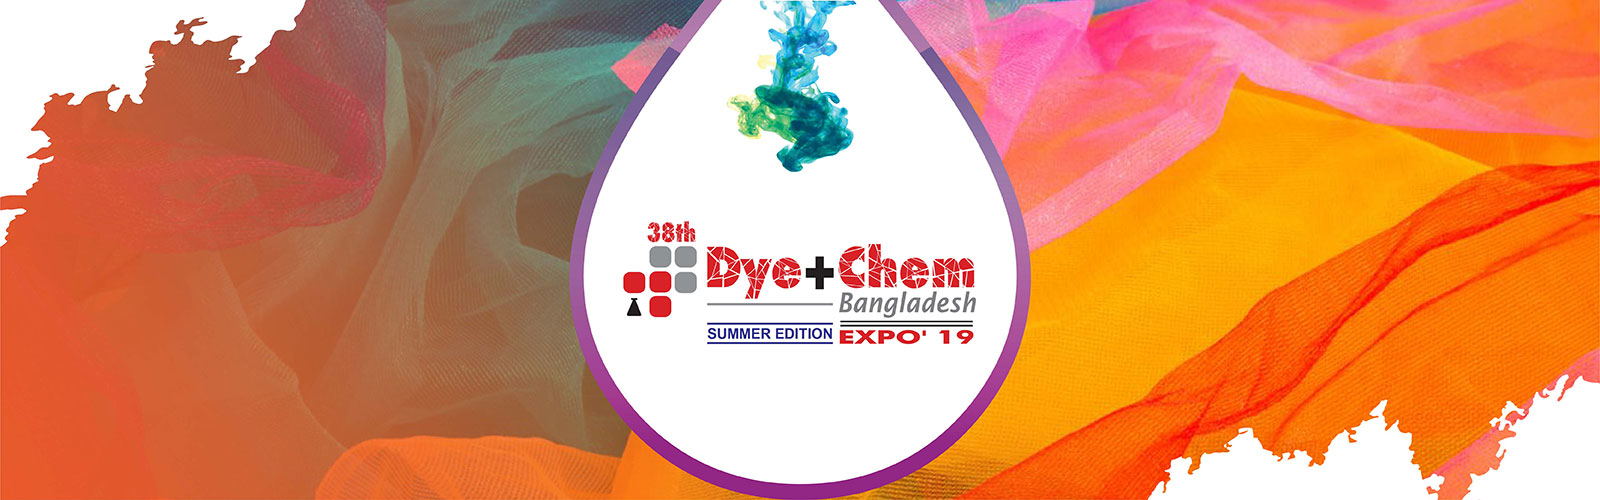 38th Dye+Chem Bangladesh 2019 International Expo